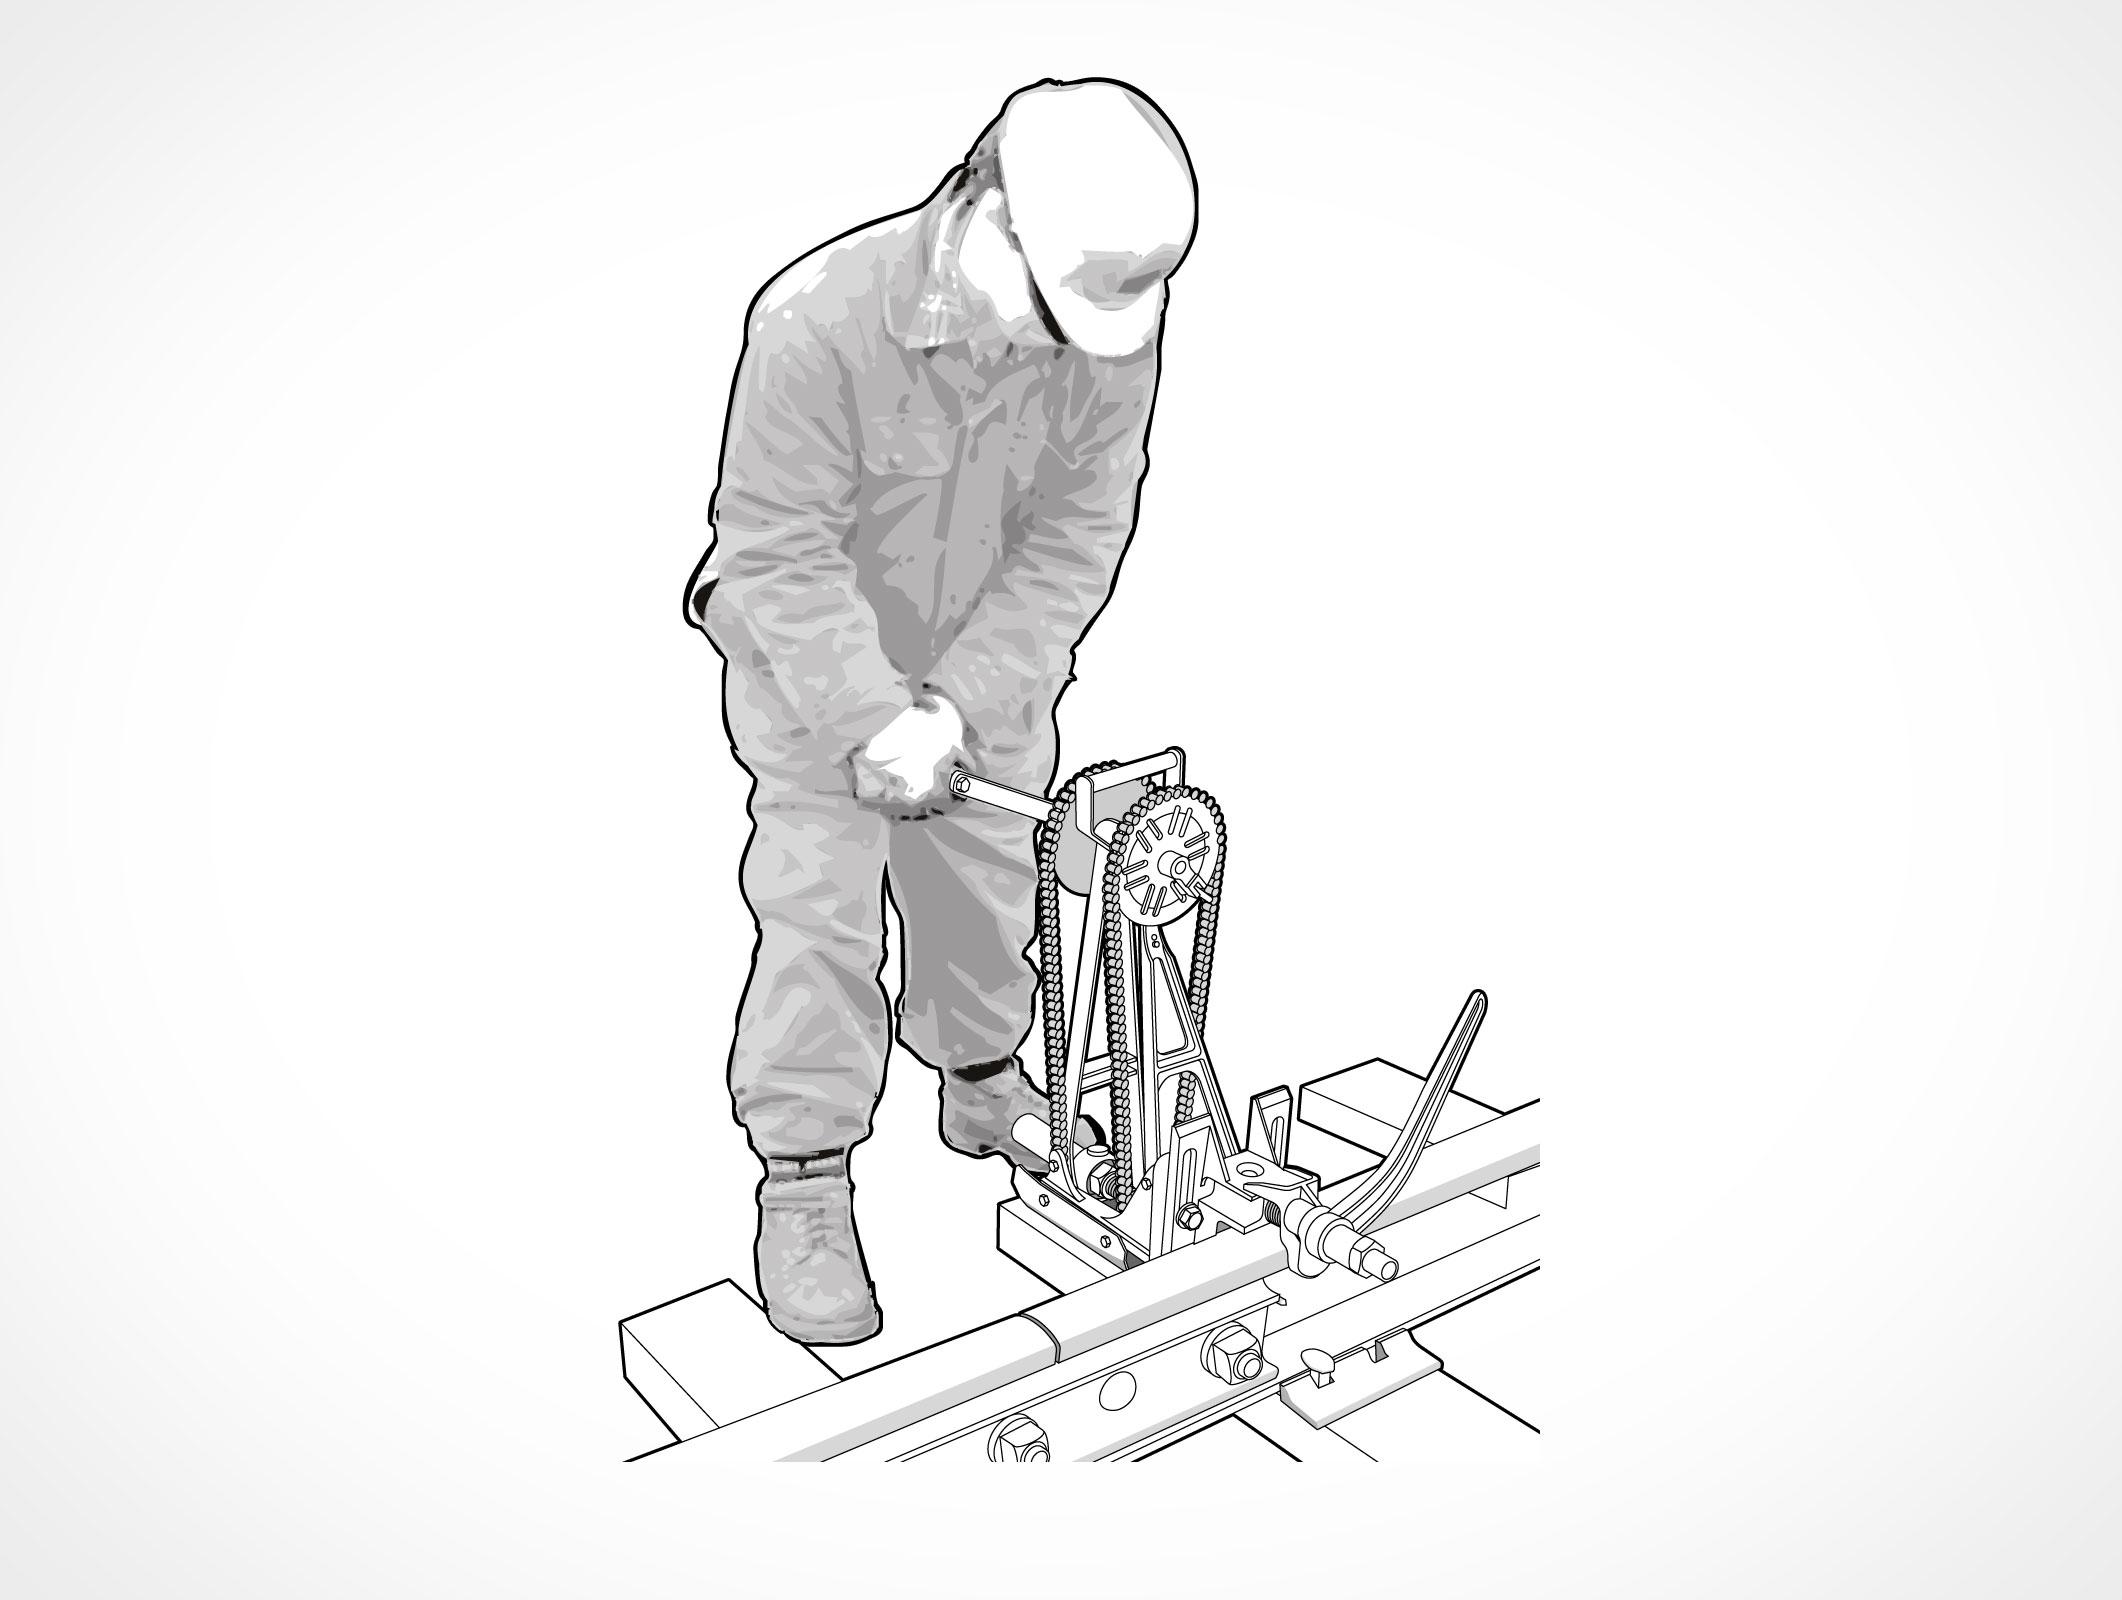 Dropping Rear Axle Advice